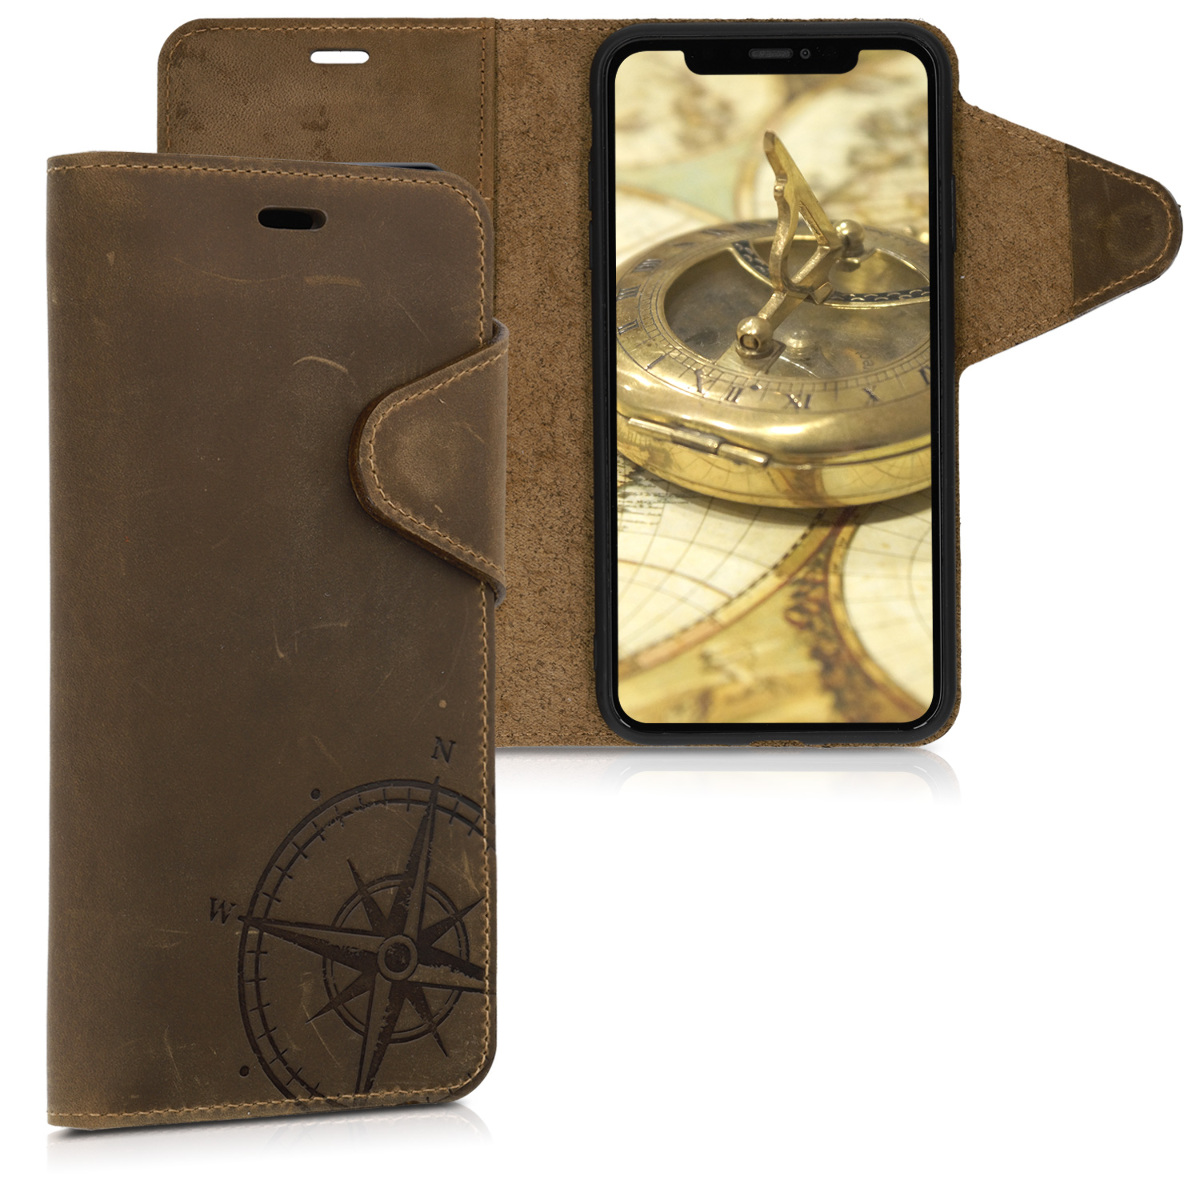 Kalibri Δερμάτινη Suede Θήκη - Πορτοφόλι iPhone XS Max - Brown Compass (46747.01)